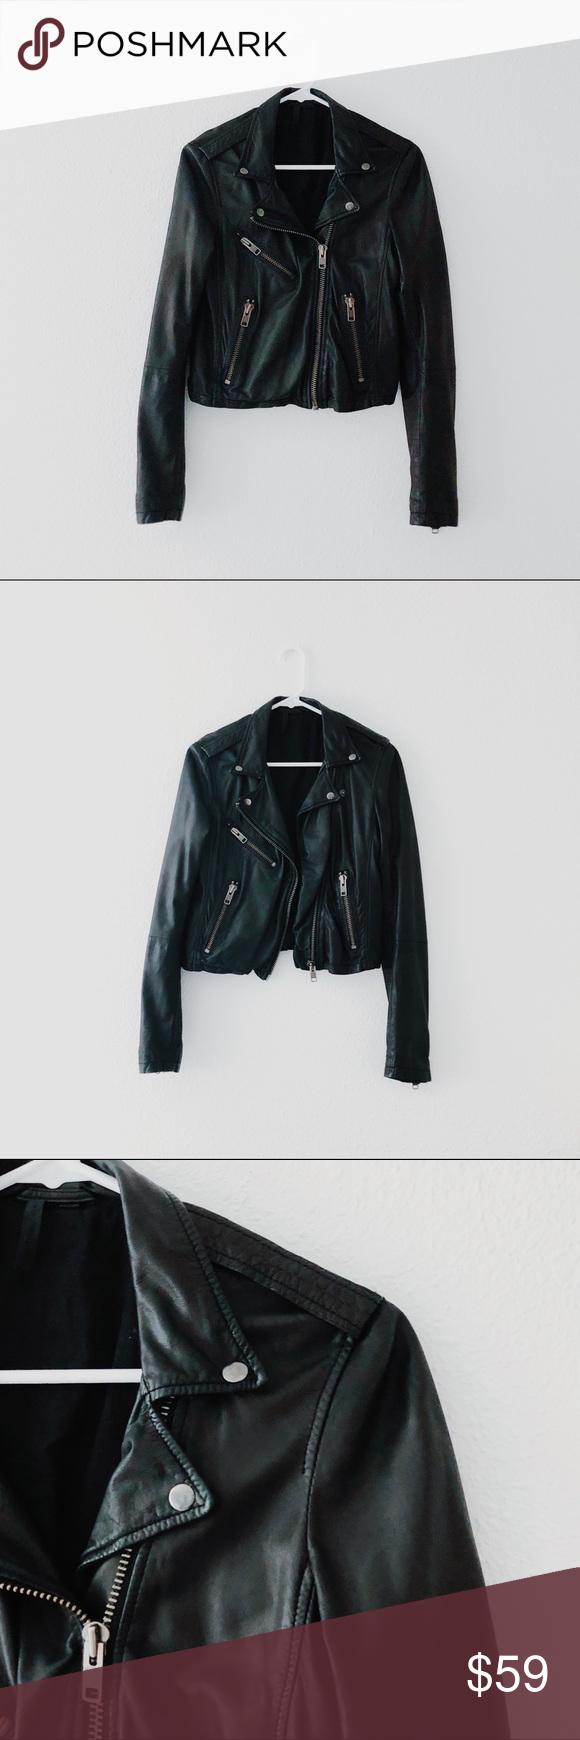 Real Leather Jacket Leather jacket, Real leather